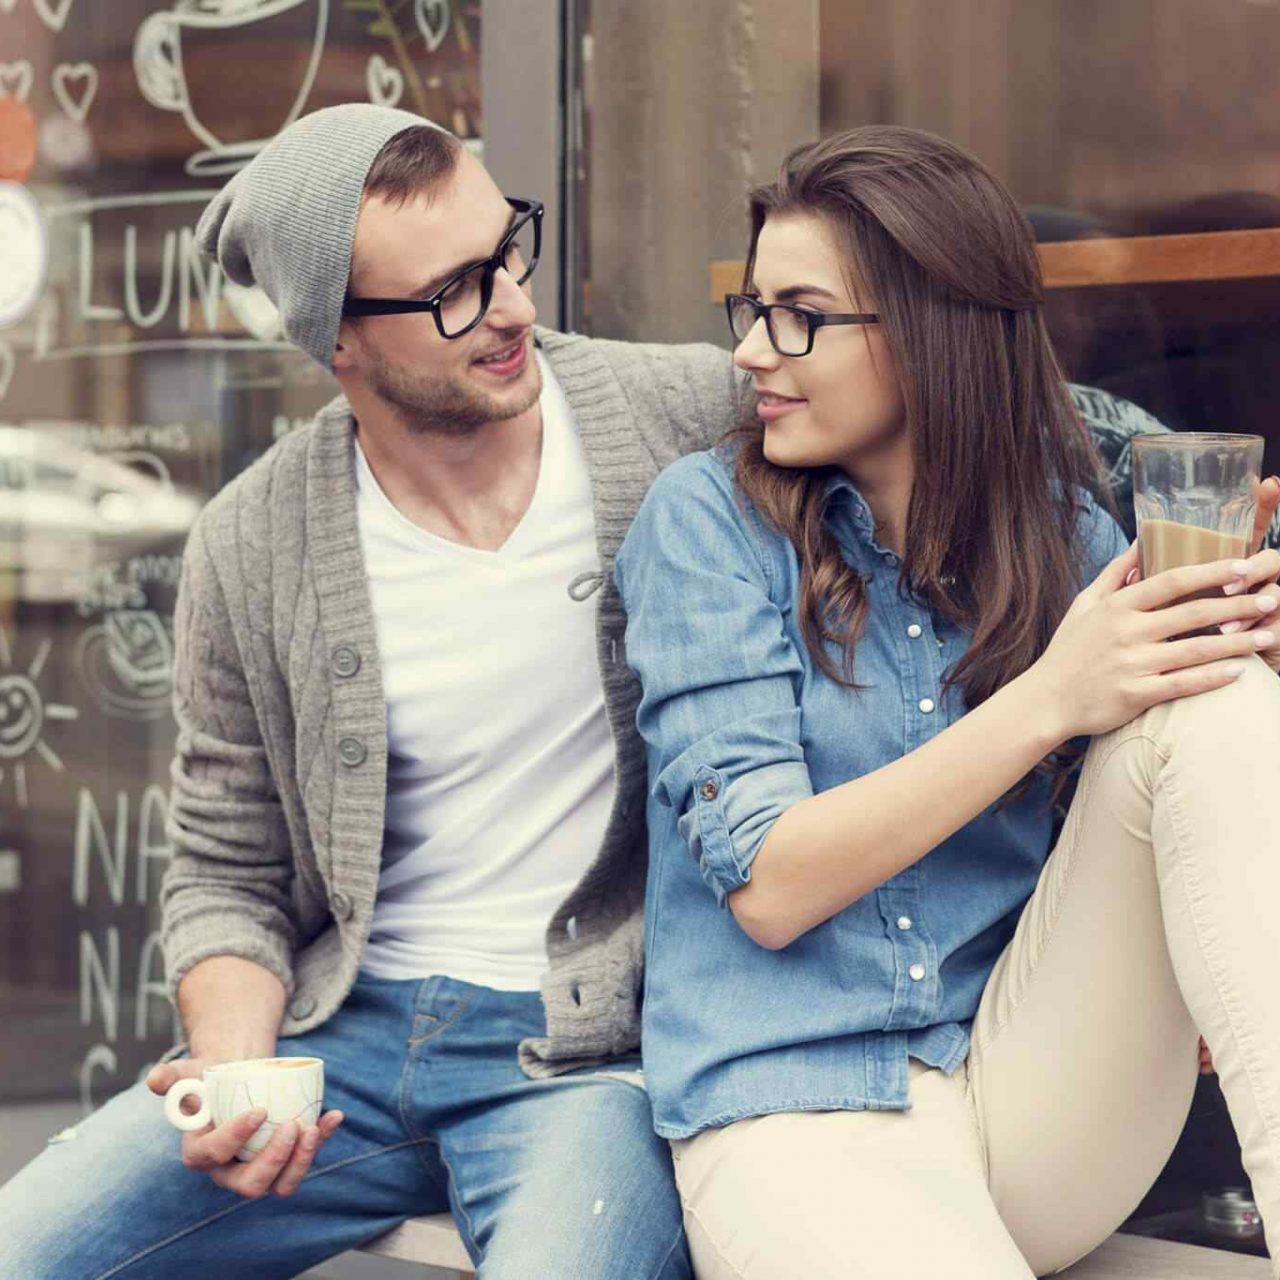 https://allabout-culture.com/wp-content/uploads/2018/01/img-class-marriage-02-1280x1280.jpg